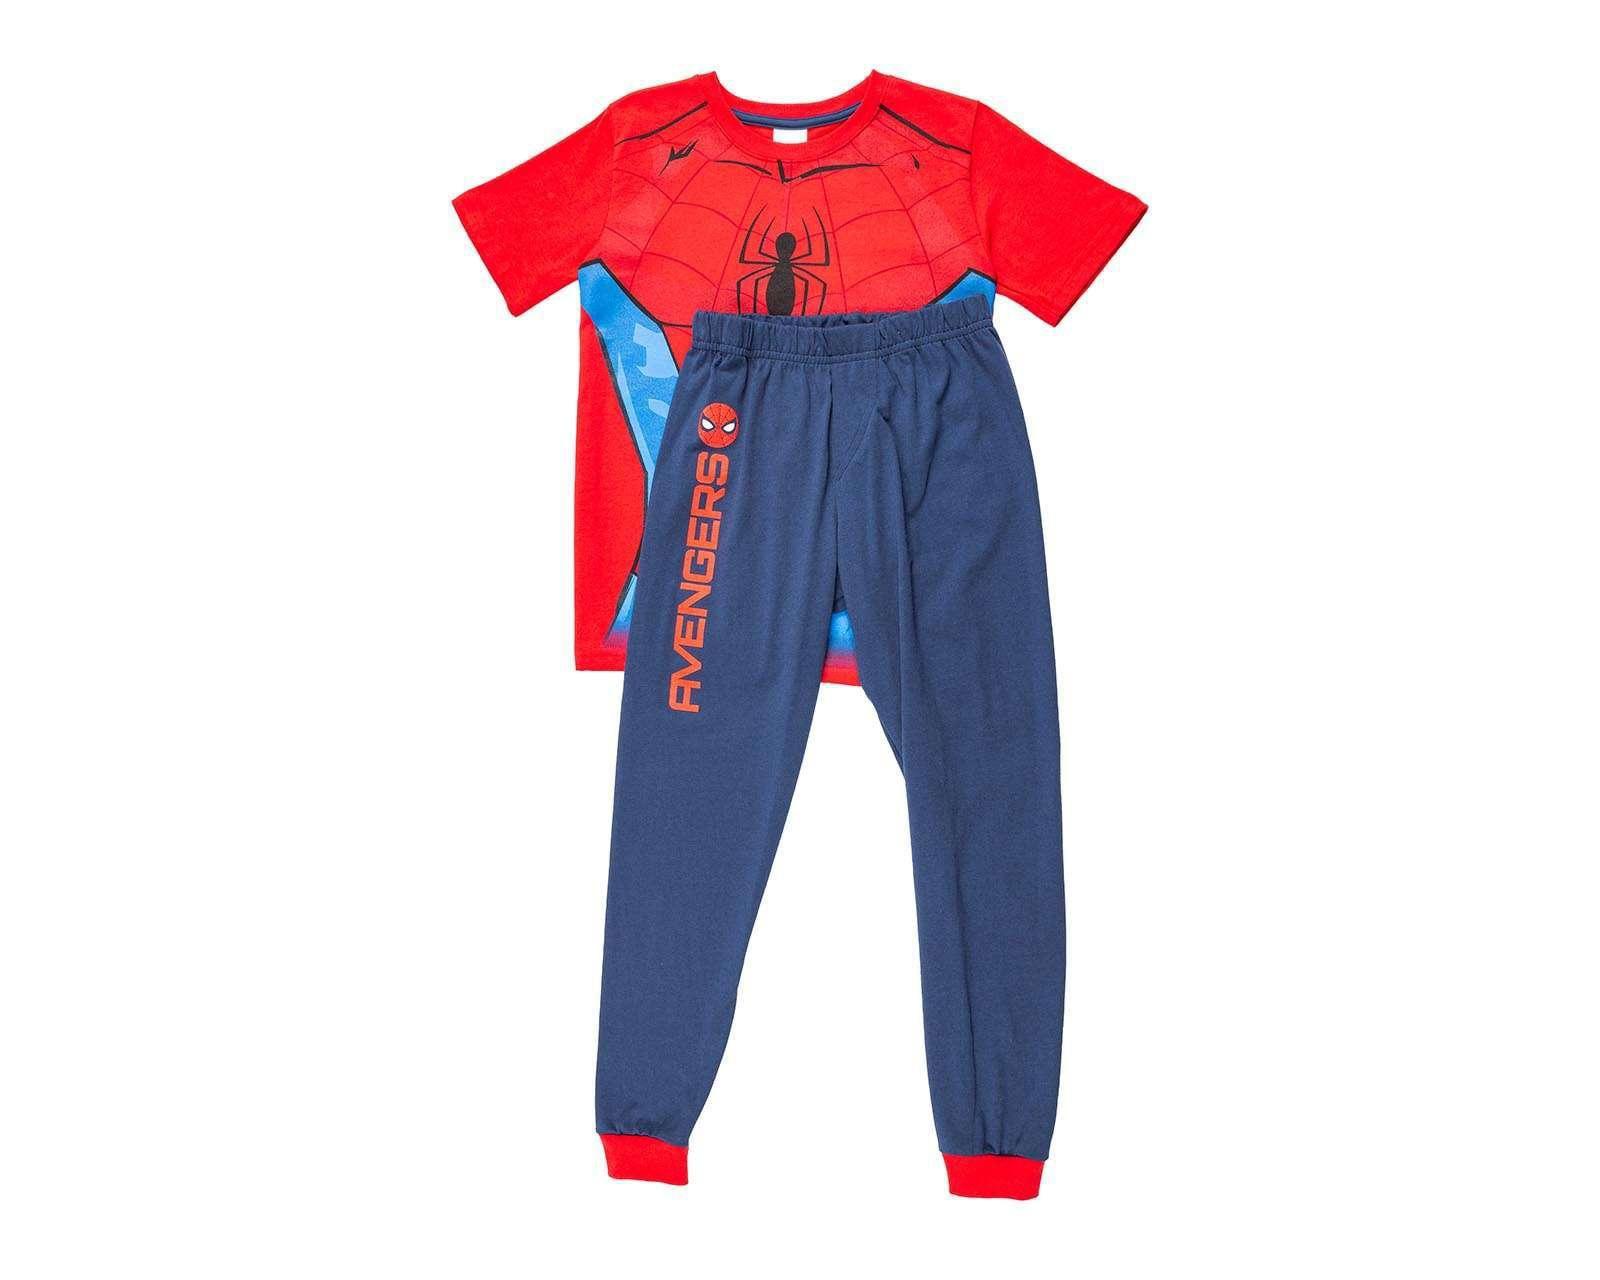 Foto 1|Pijama Spiderman para Niño